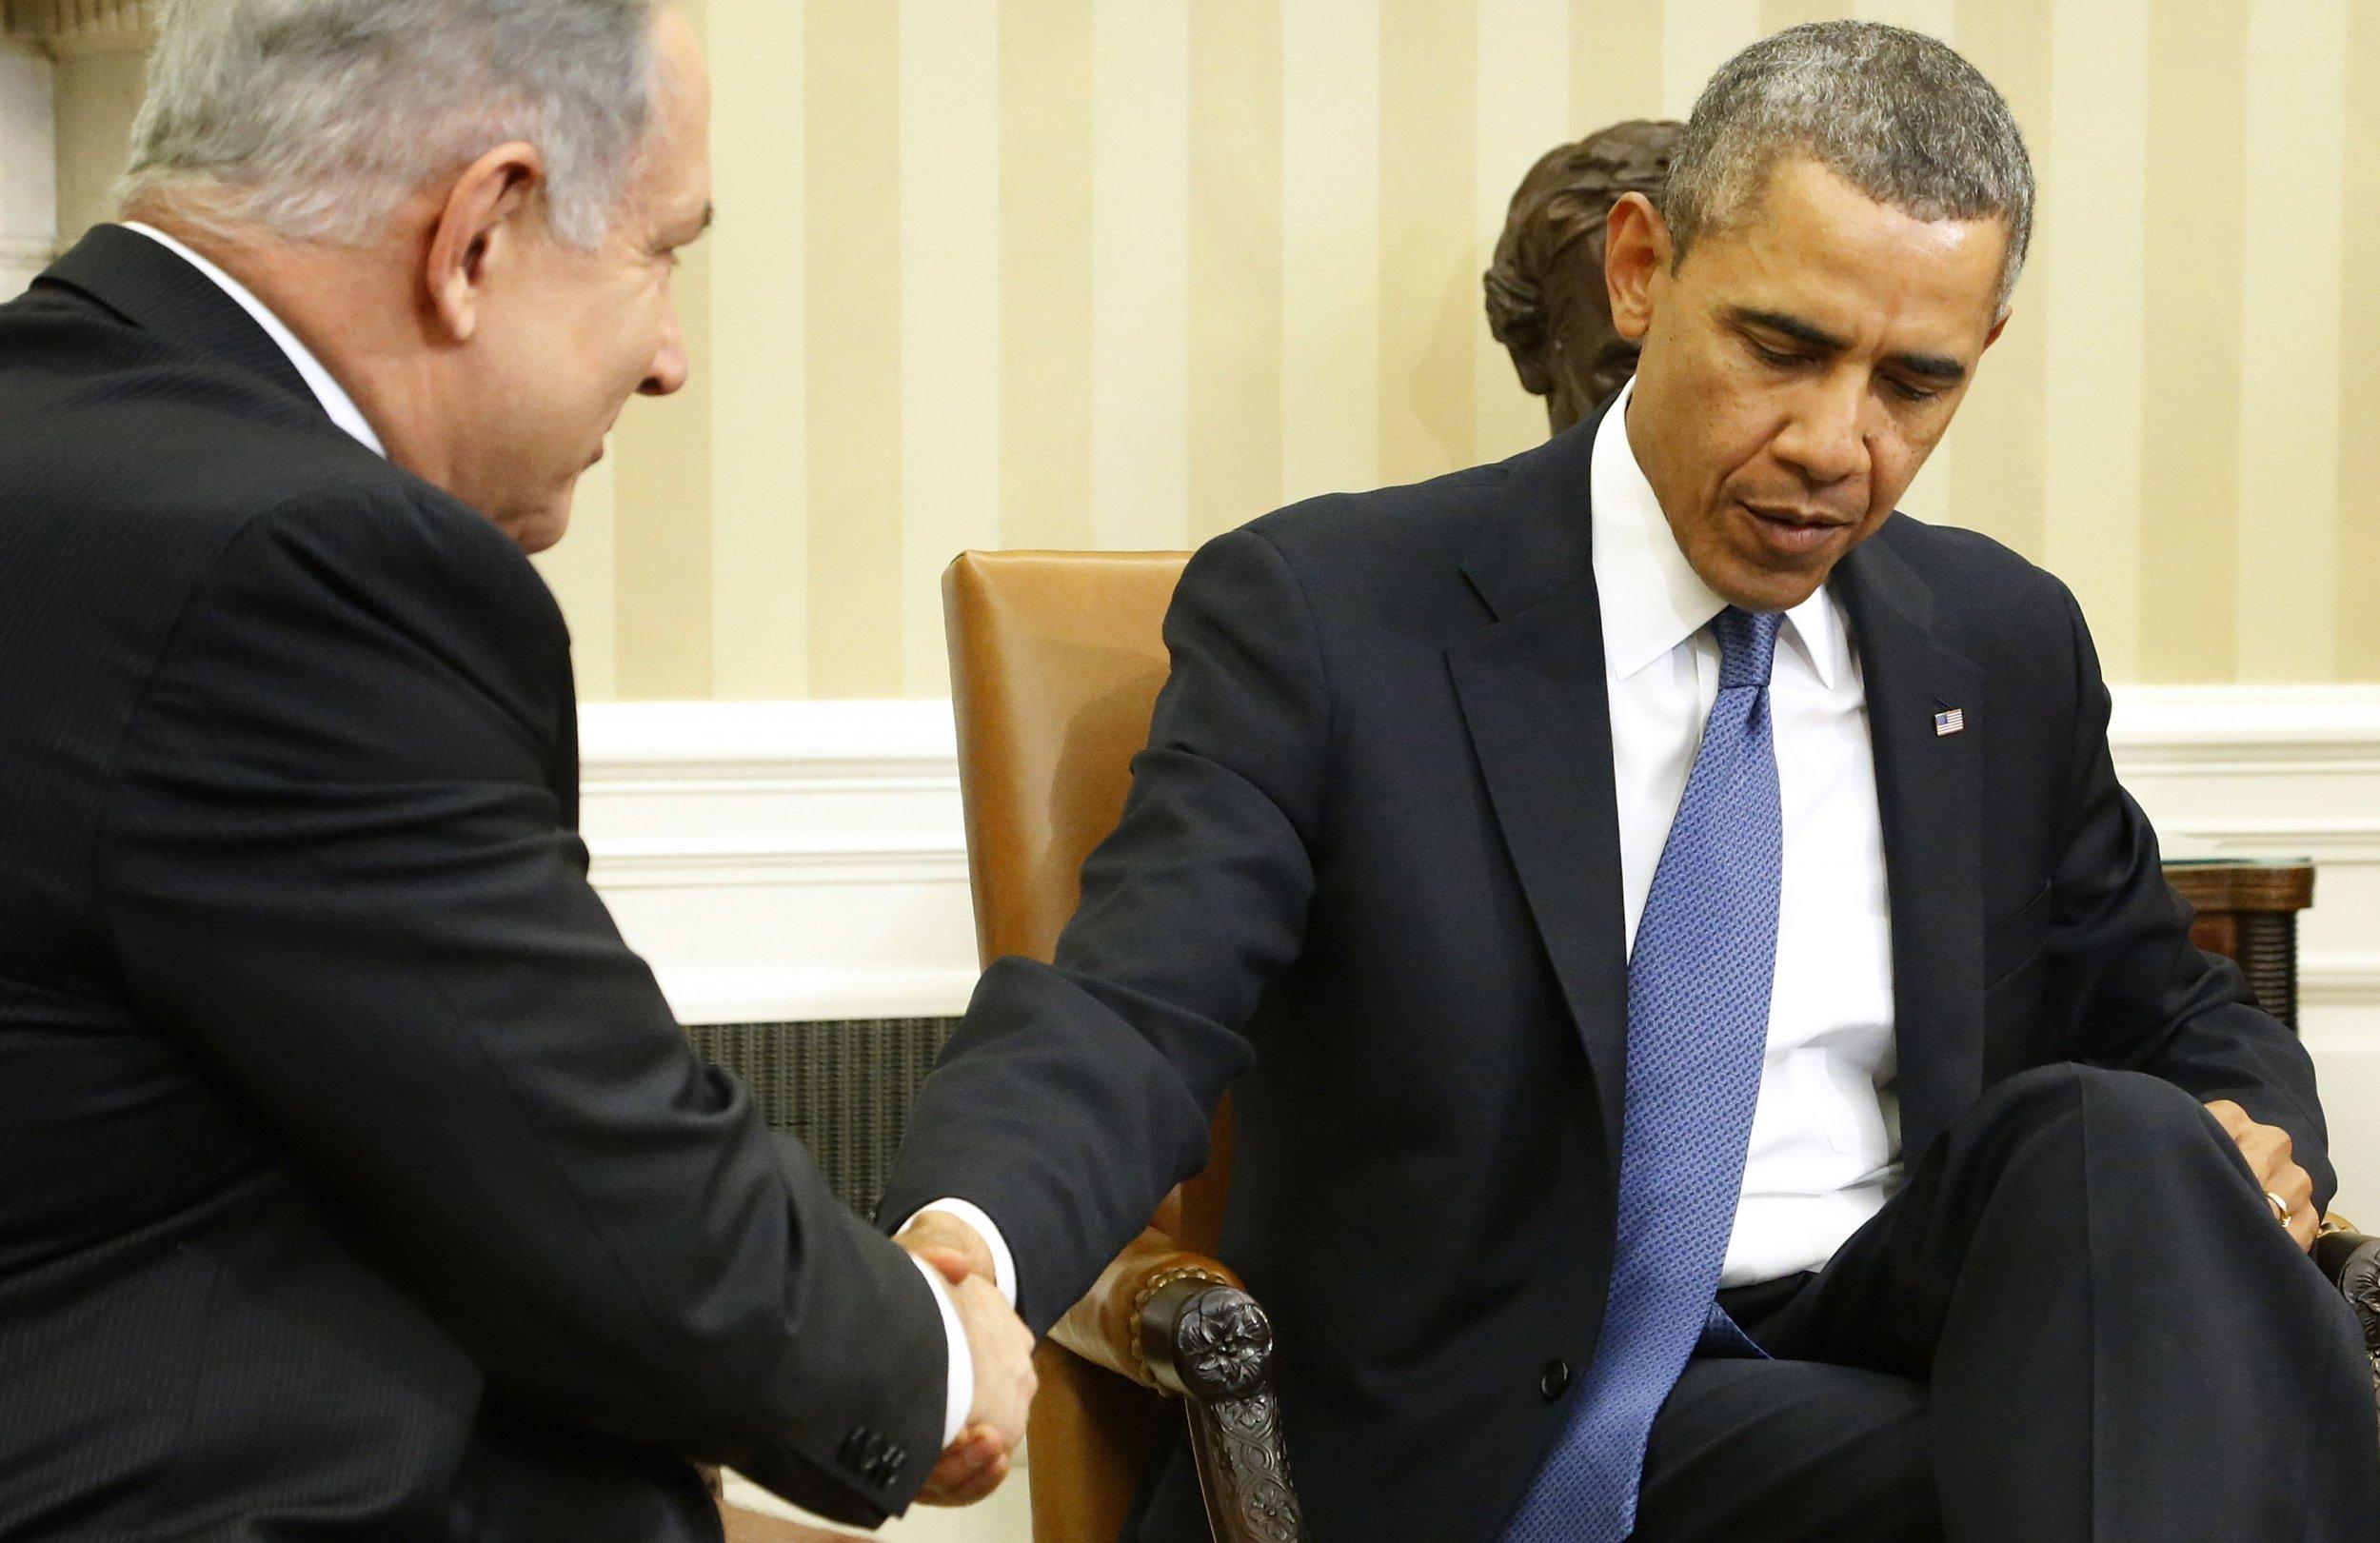 netanyahu and obama relationship to bush